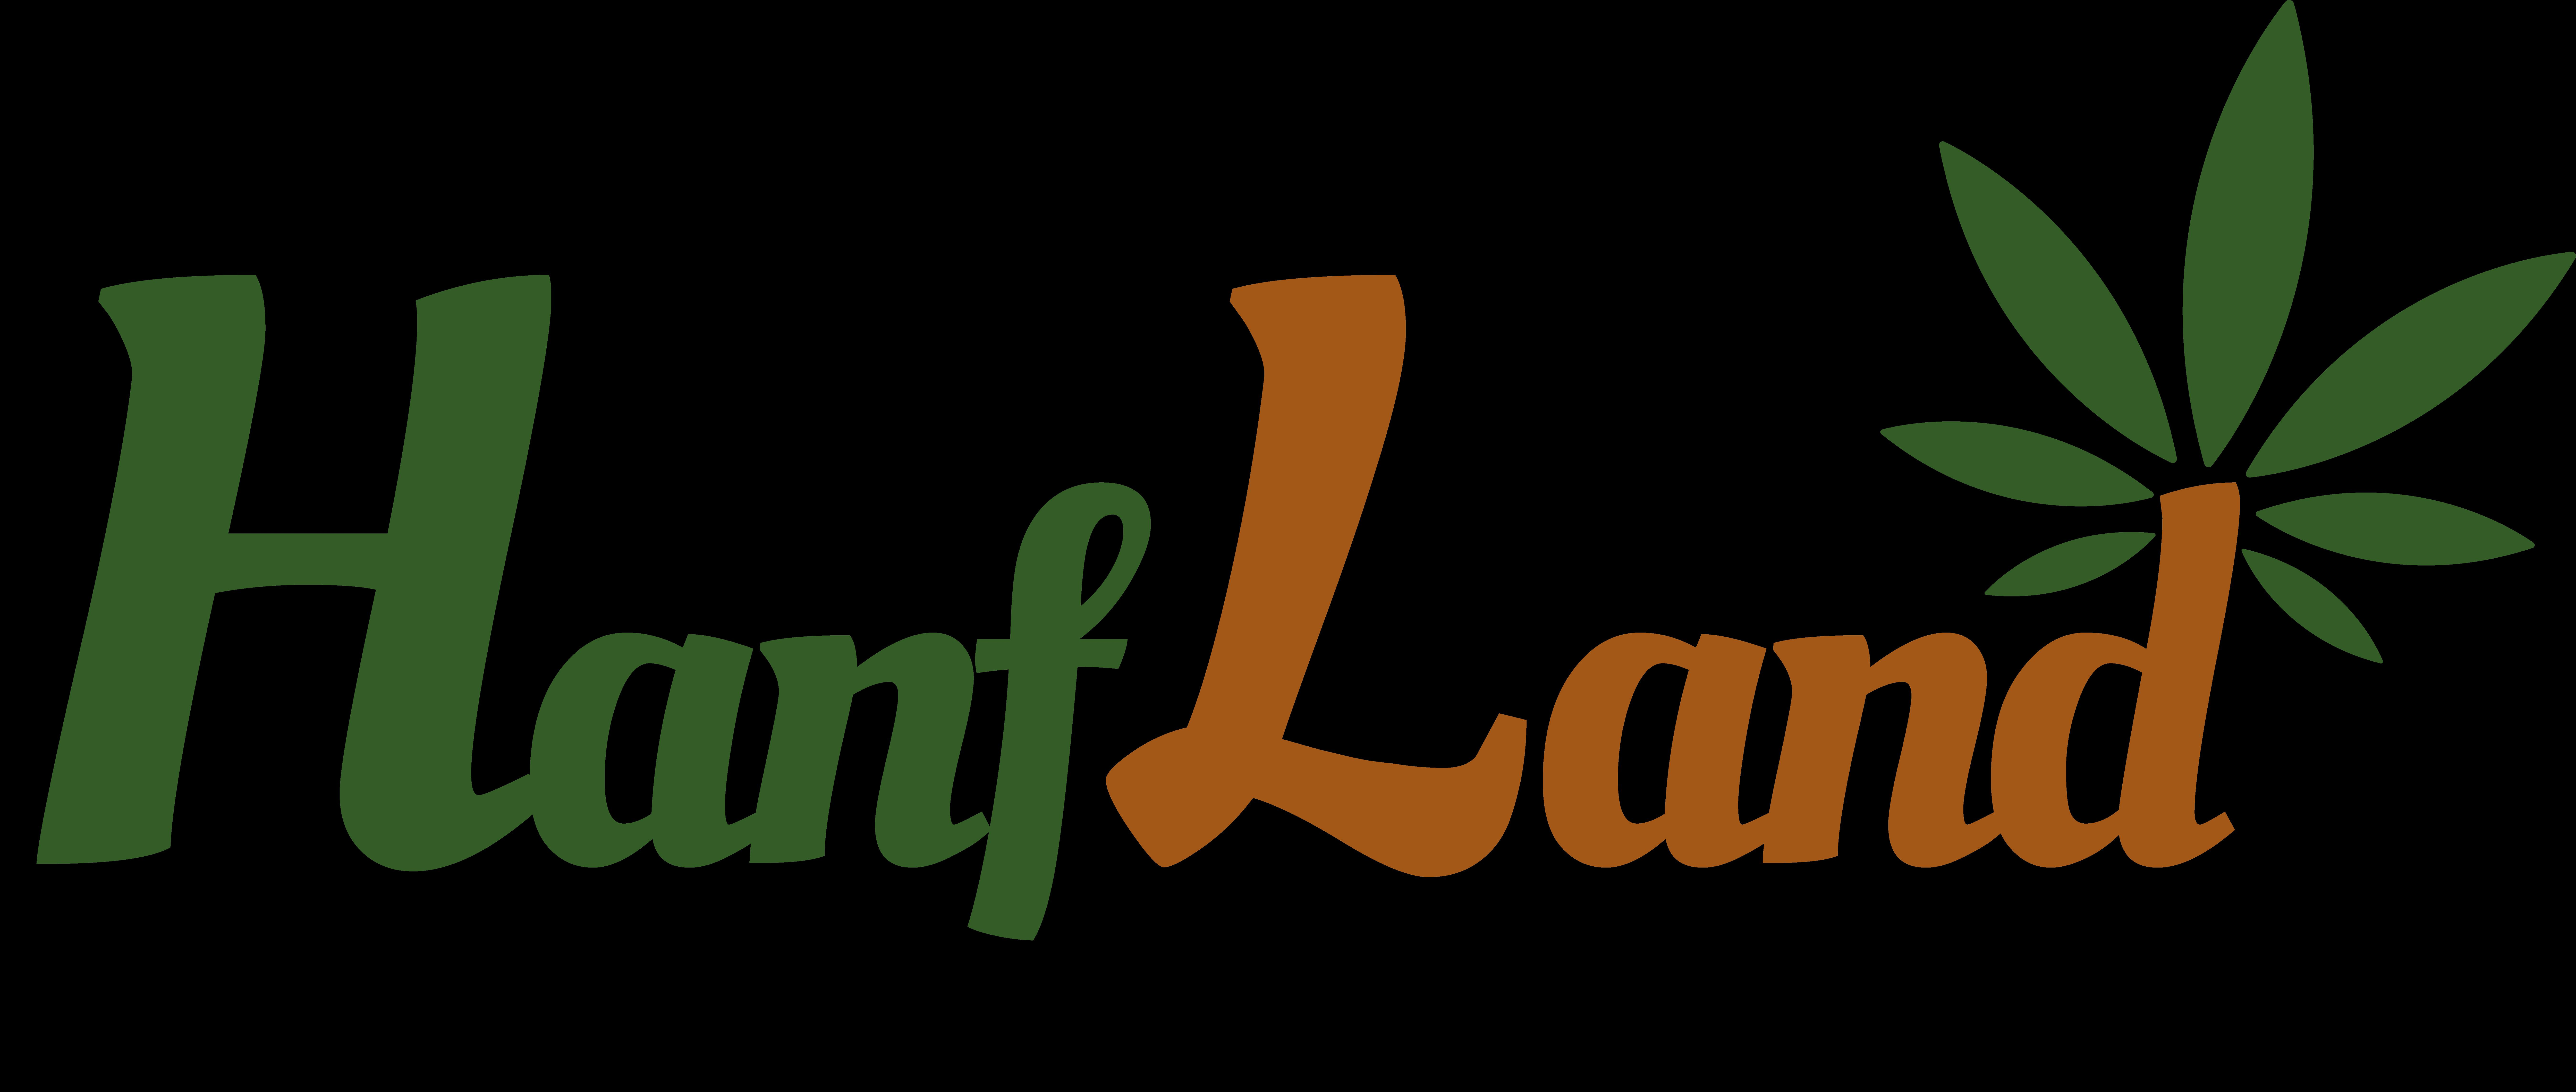 Hanfland GmbH